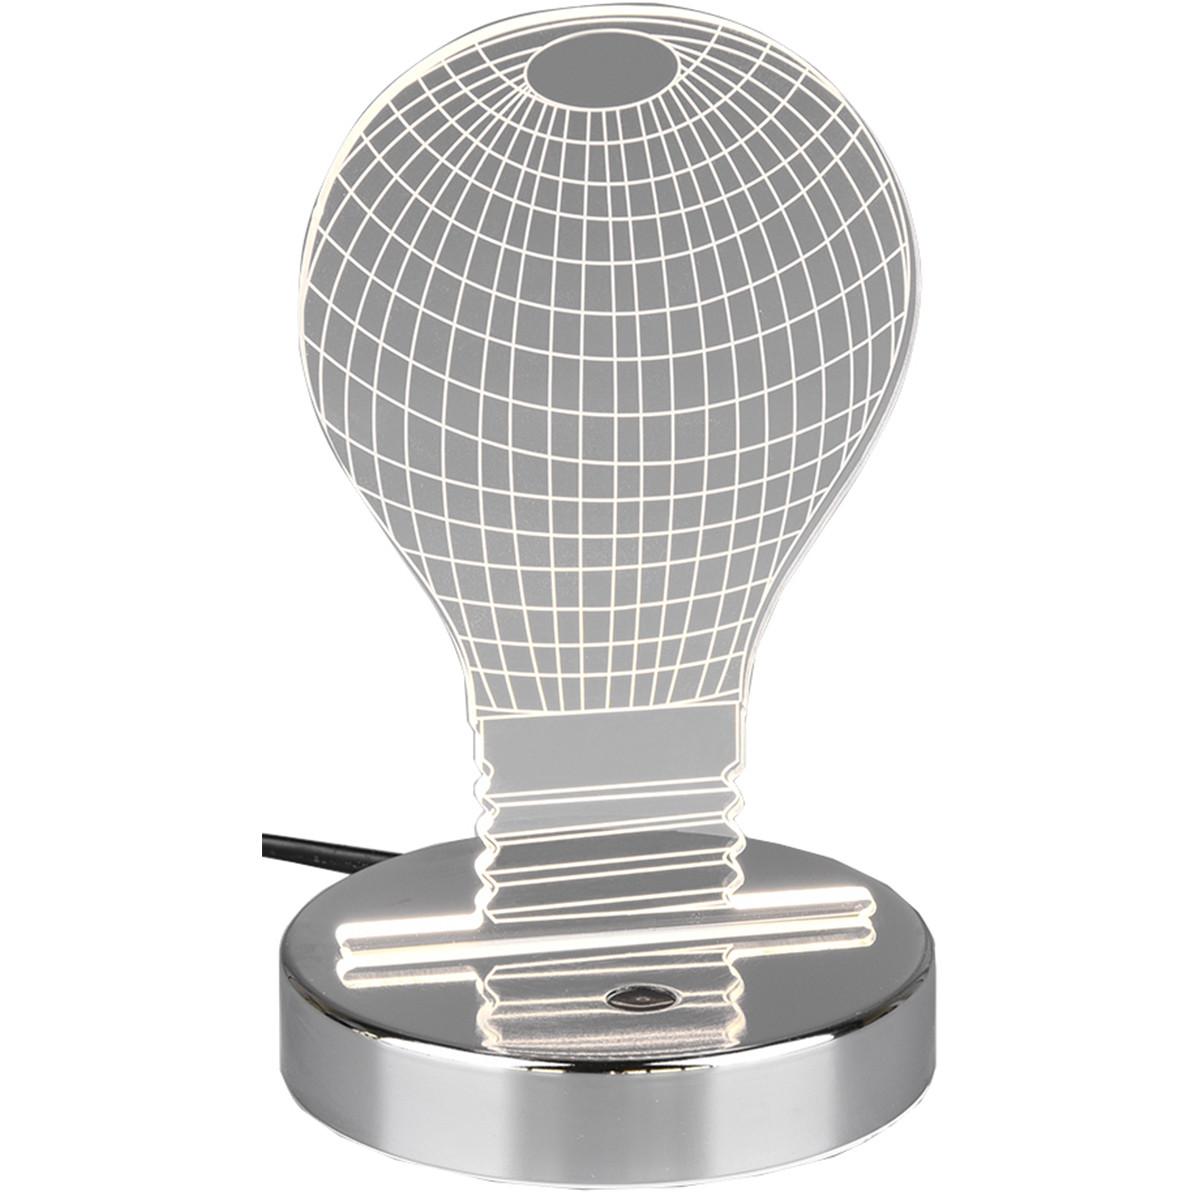 LED Tafellamp - Trion Bilo - 3W - RGBW - Rond - Glans Chroom - Aluminium